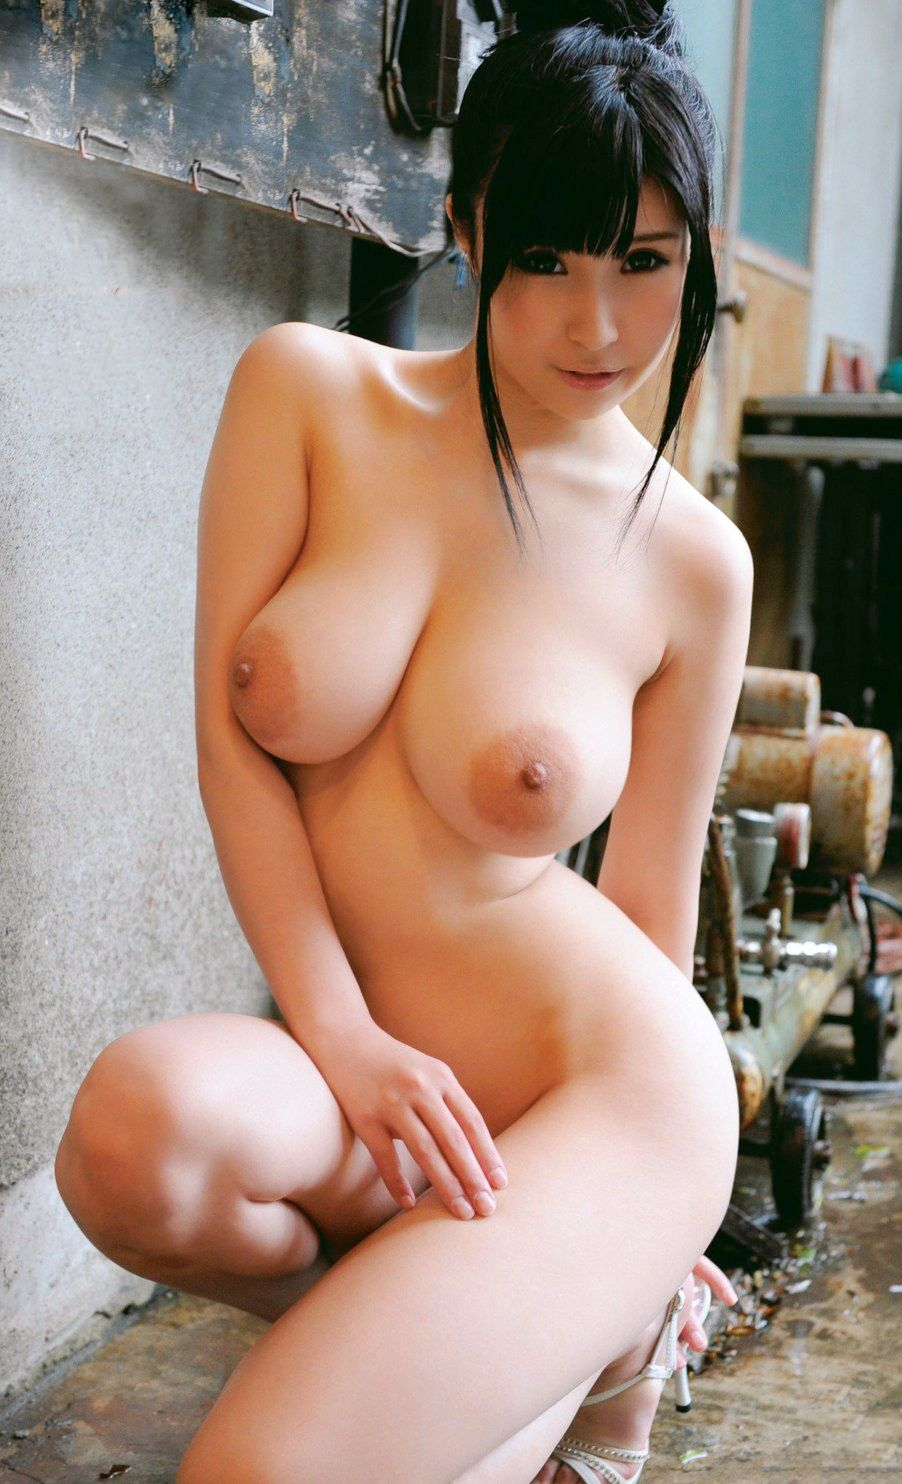 busty asian areolas | boobs | pinterest | twitter followers, asian